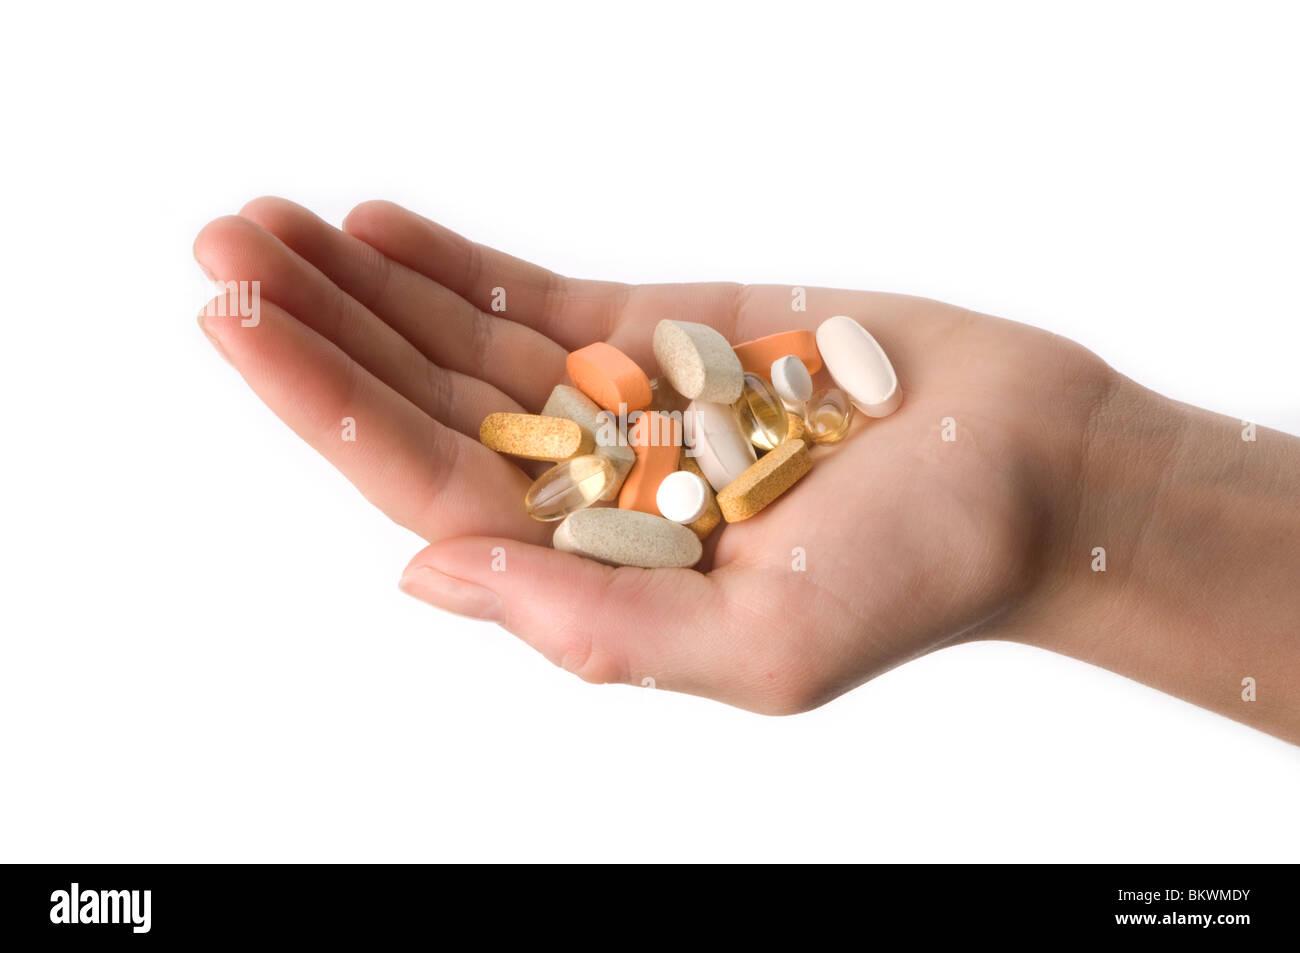 hand holding pills - Stock Image